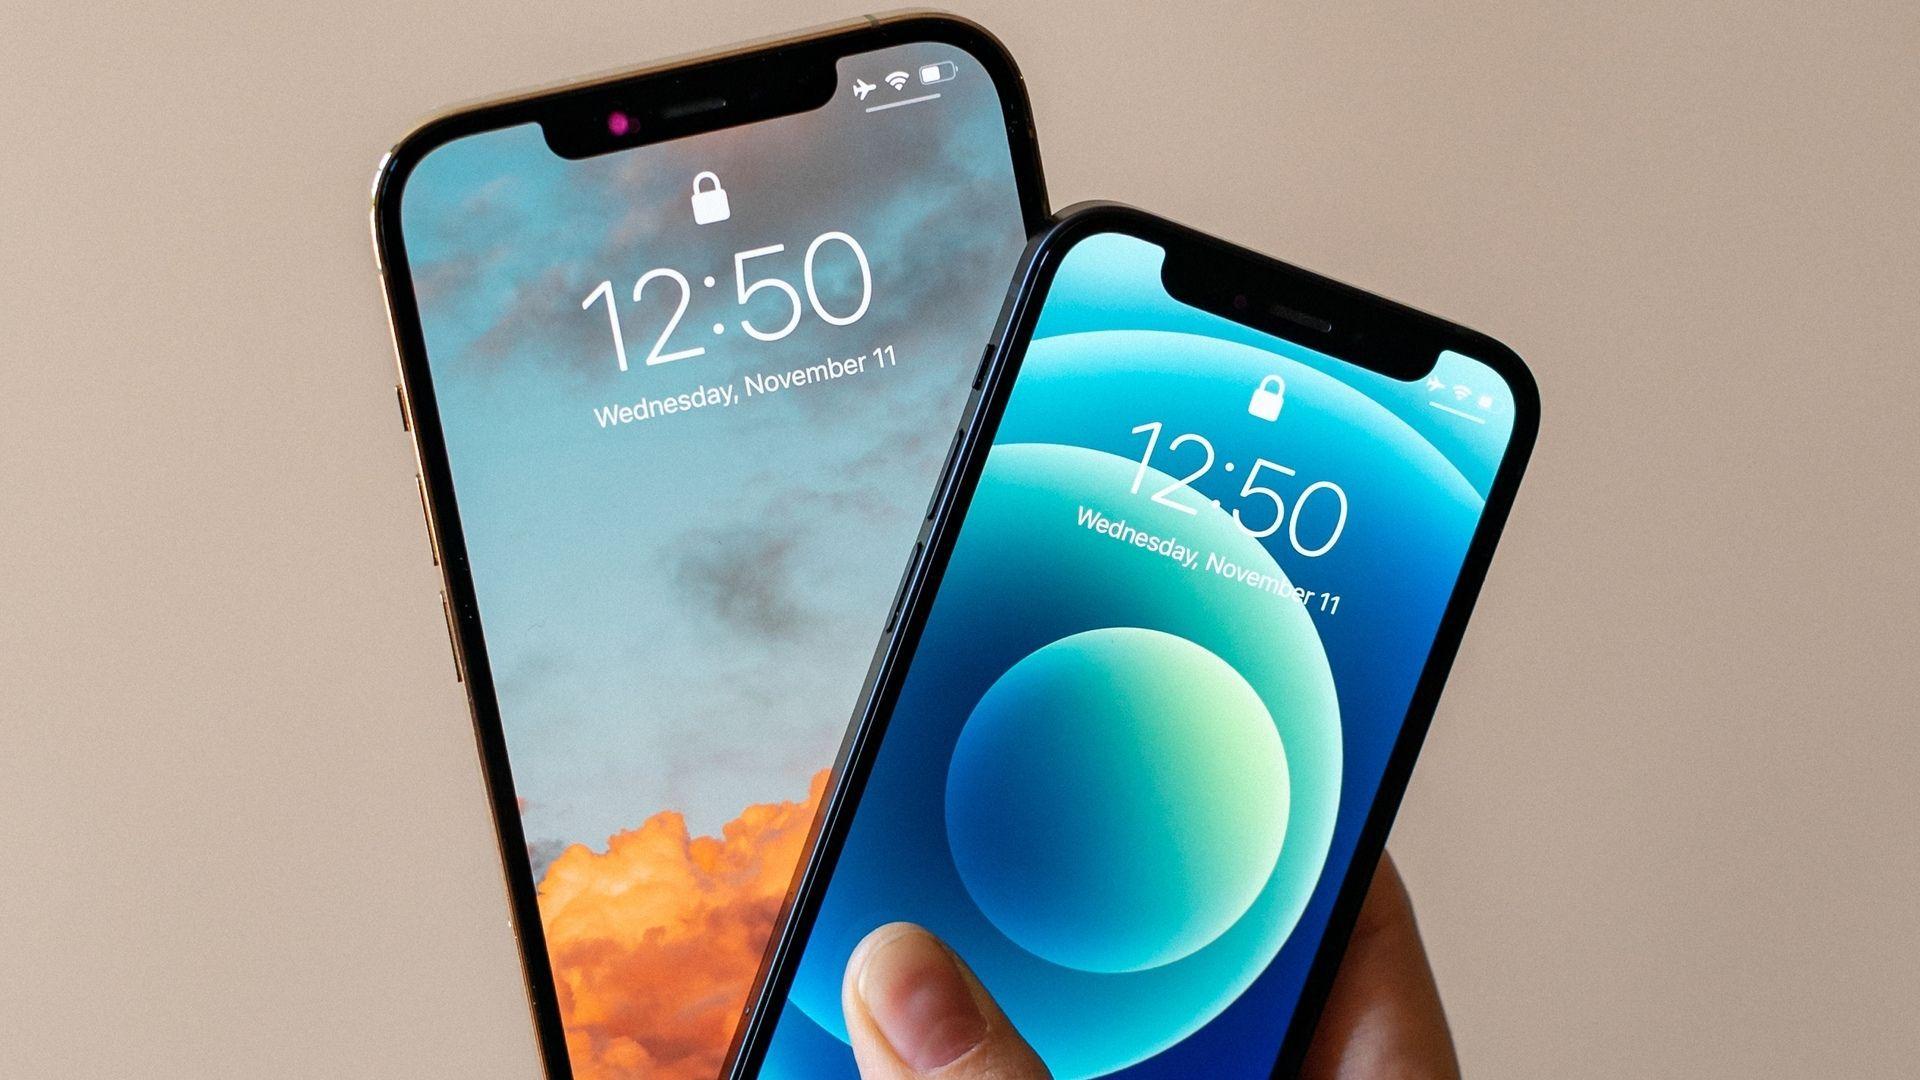 Diferença de tamanho entre o iPhone 12 Mini e iPhone 12 Pro Max.